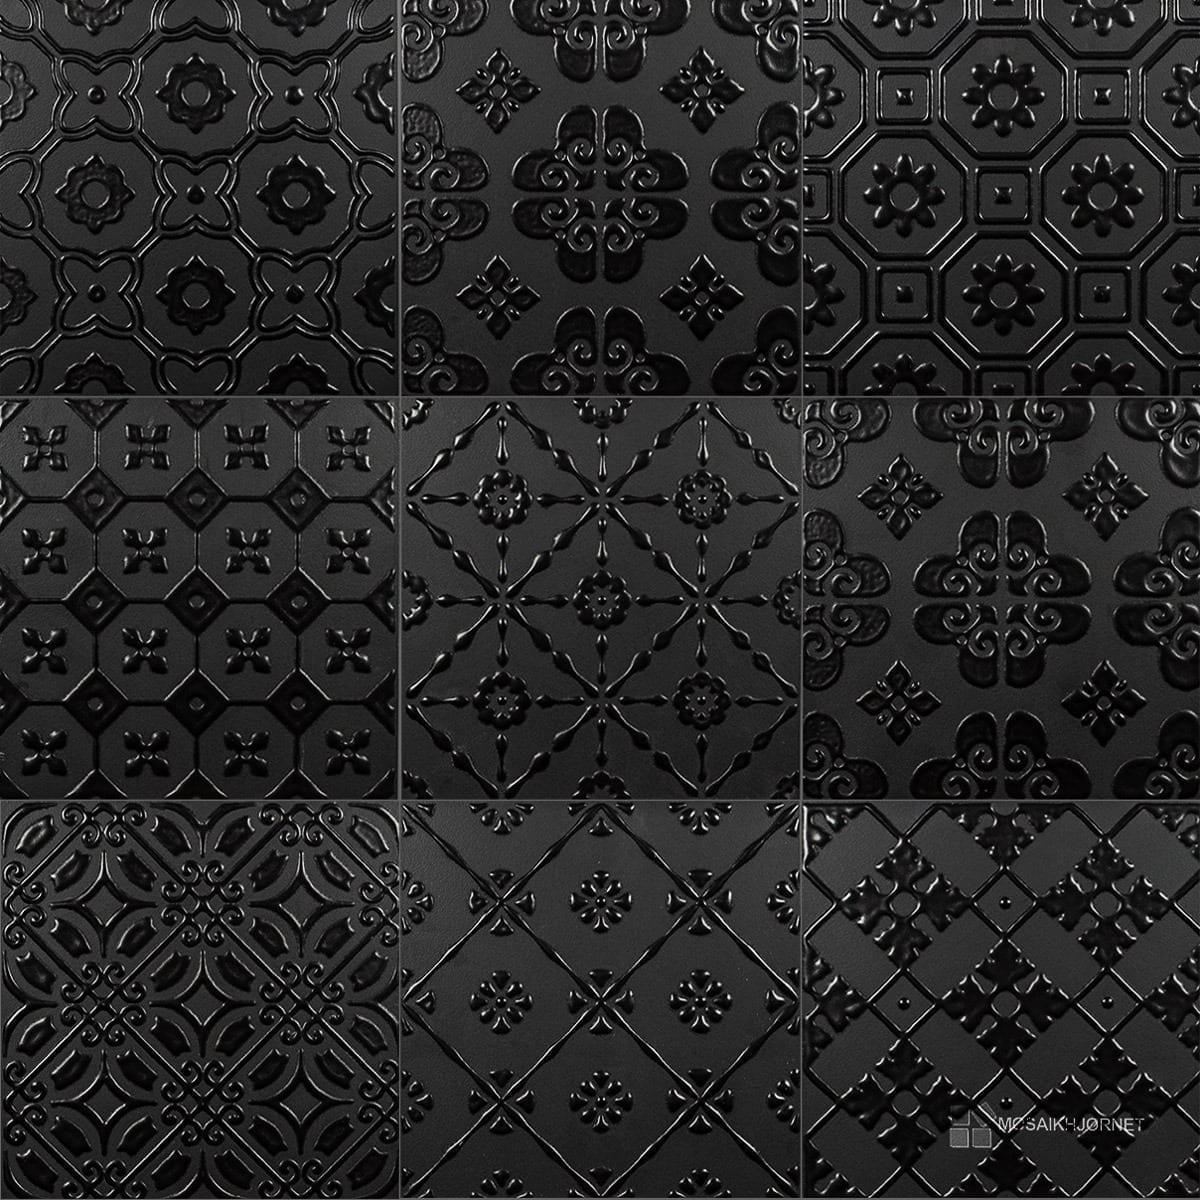 #686763 Mest effektive 20x20 Bon Ton Sort På Sort Mosaikhjørnet Fliser Klinker Og Mosaik Til Ba  Fliser Til Bad Og Køkken 4805 120012004805